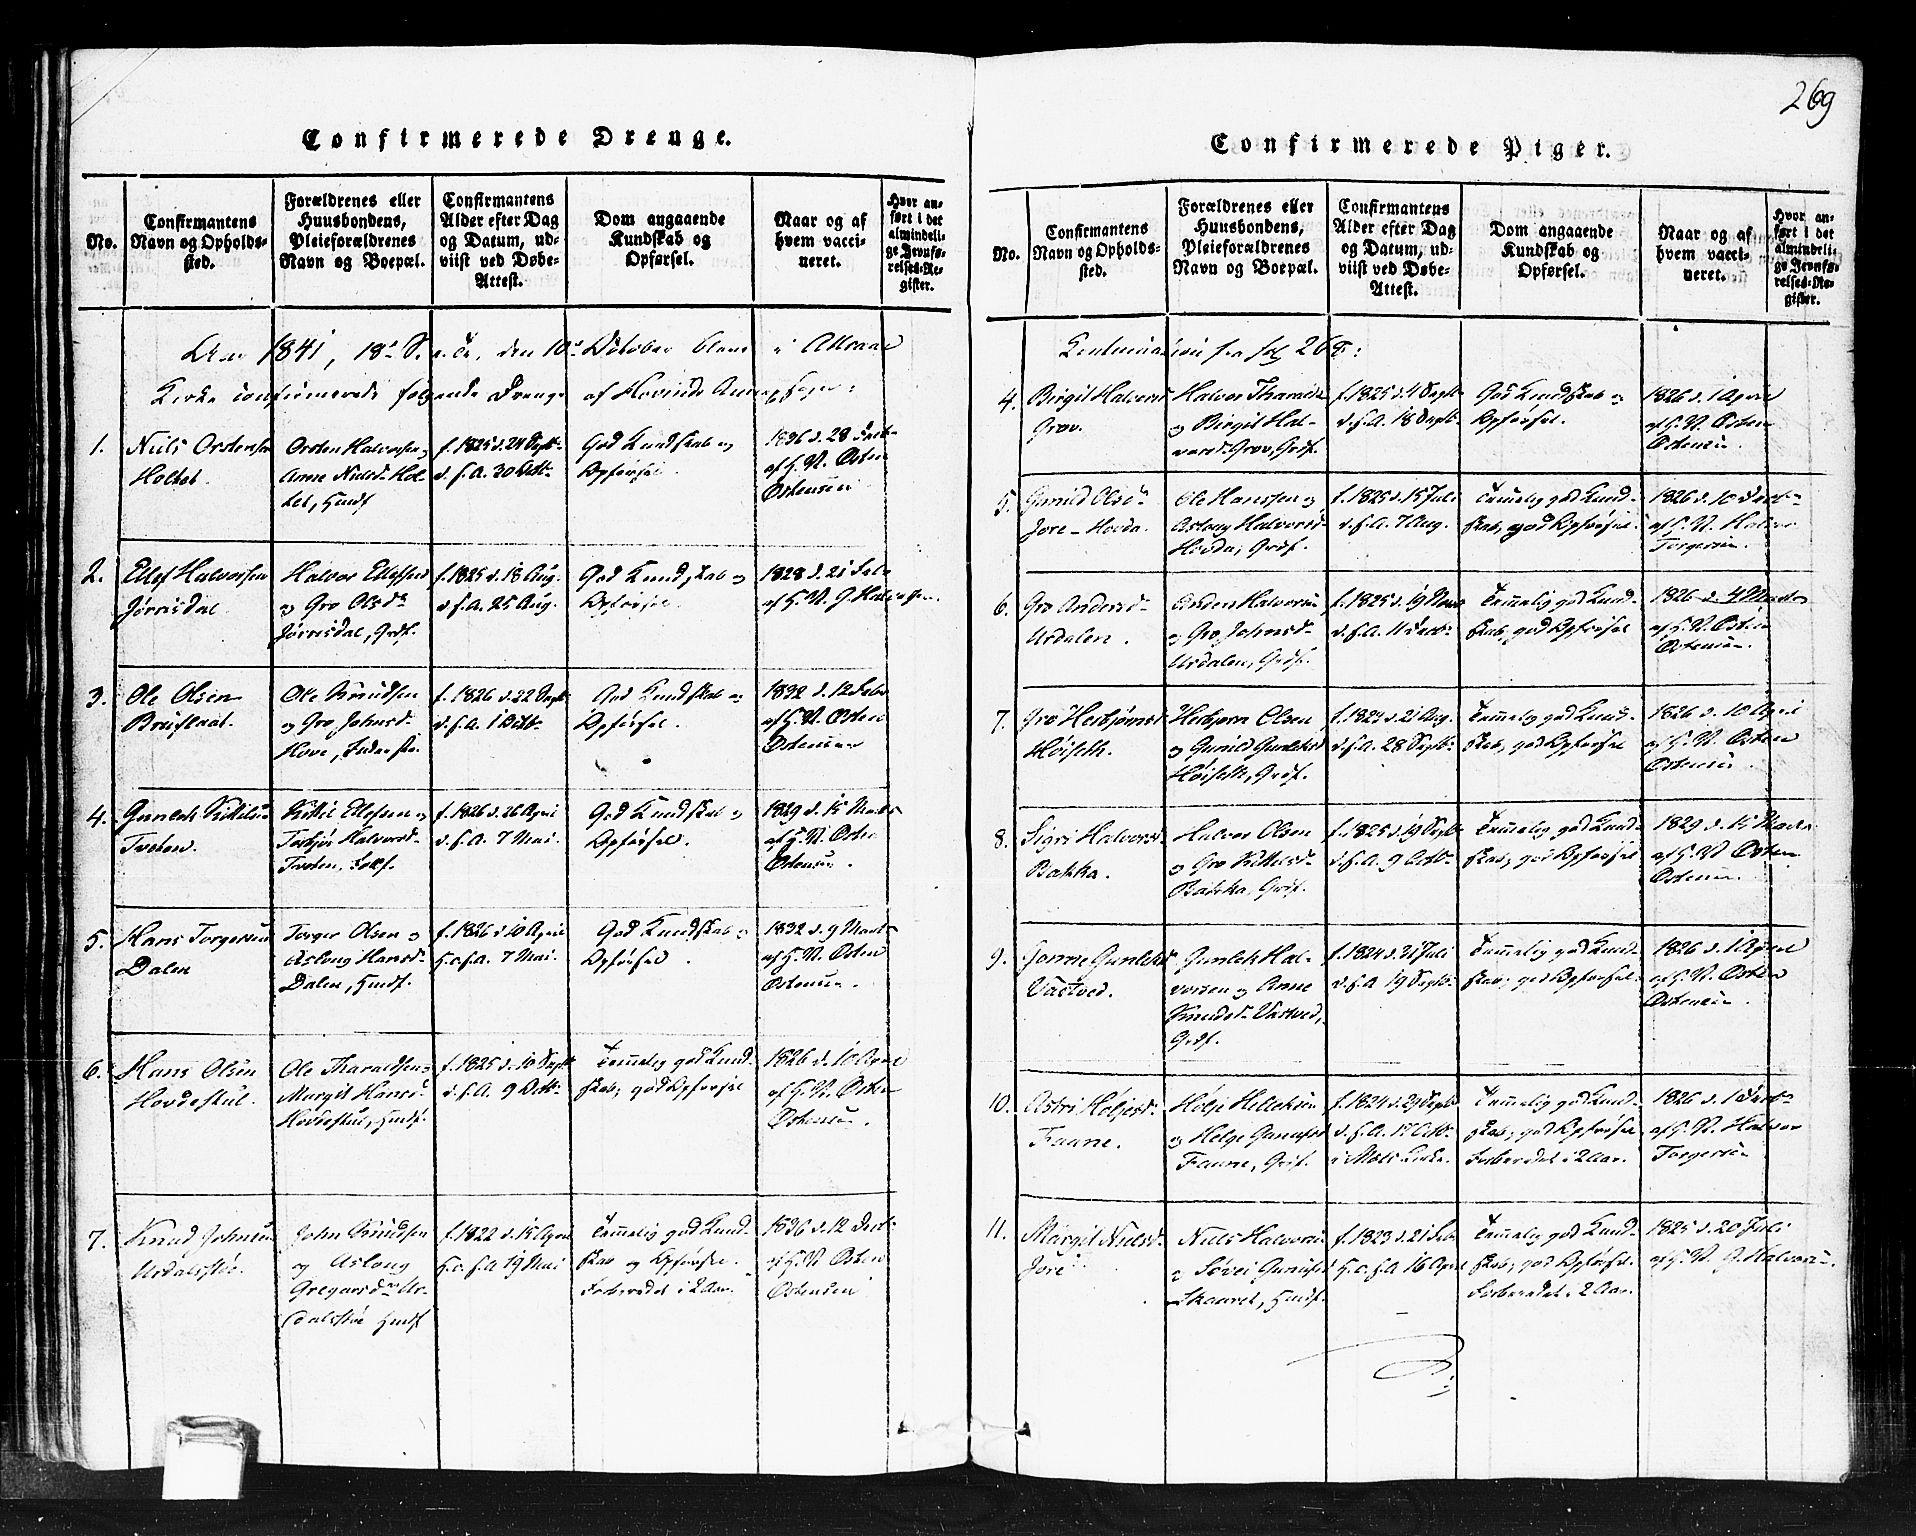 SAKO, Gransherad kirkebøker, F/Fb/L0002: Ministerialbok nr. II 2, 1815-1843, s. 269